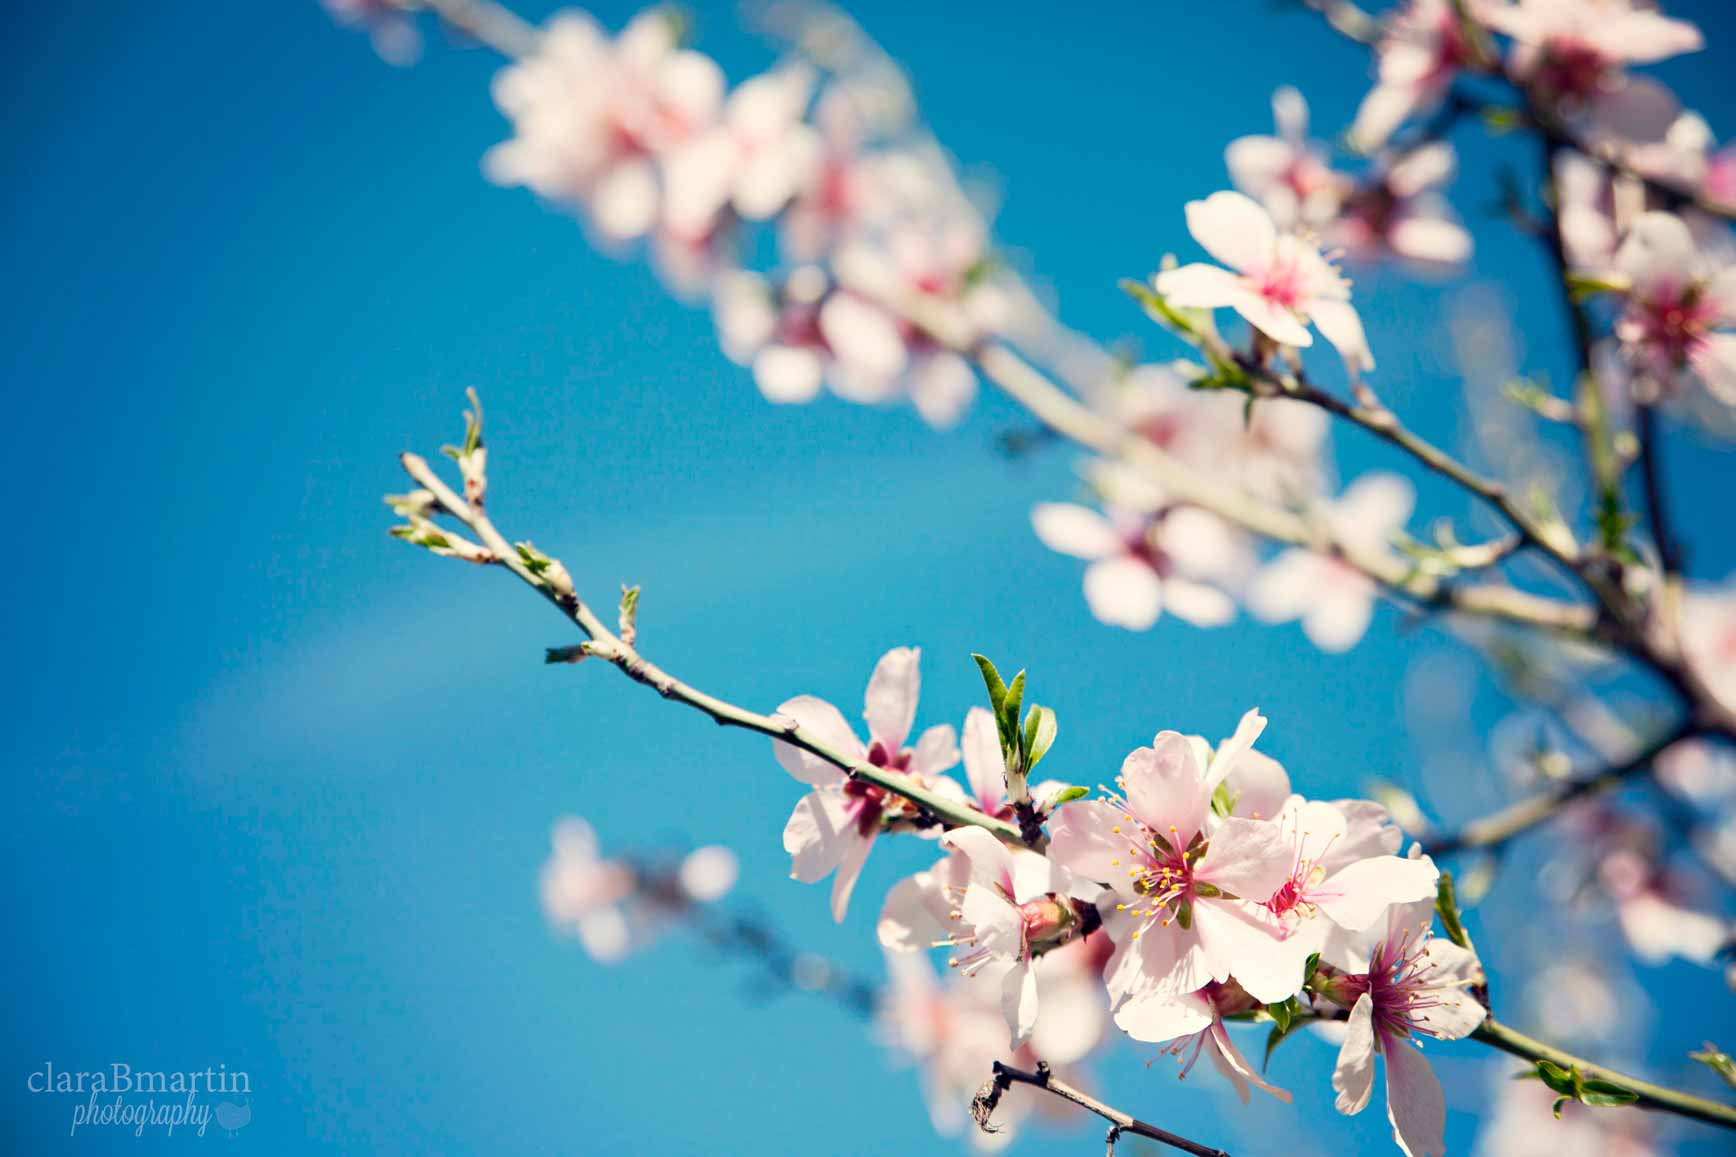 Primavera_claraBmartin06